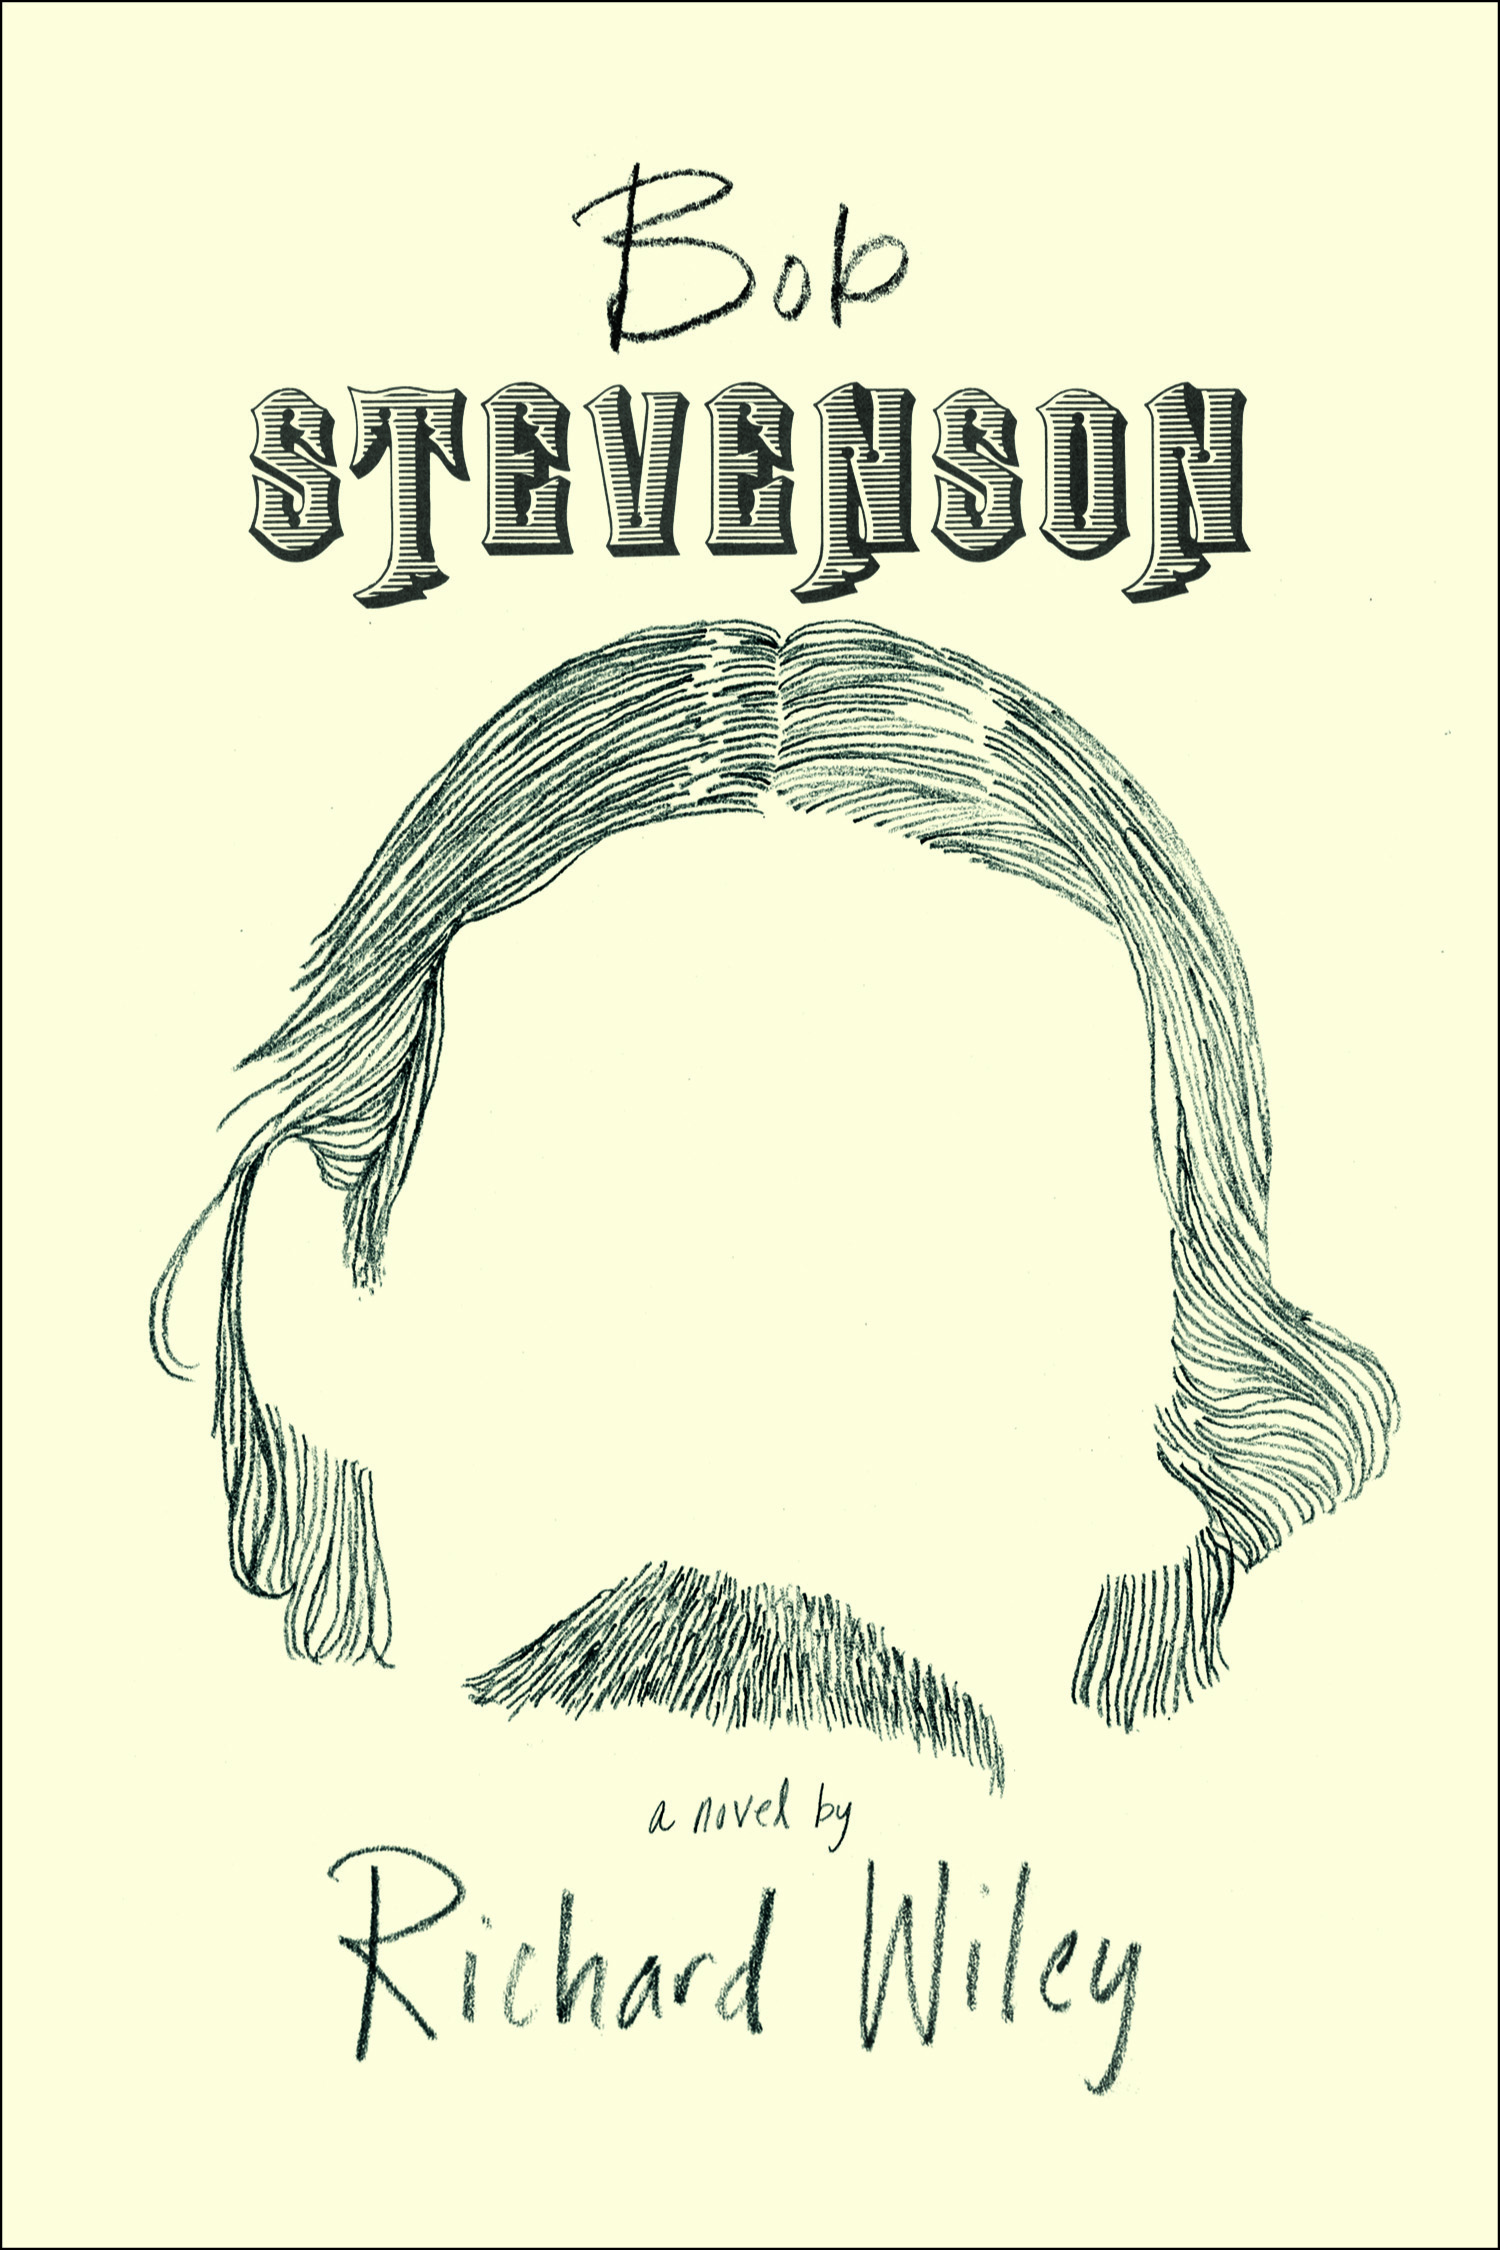 BOB STEVENSON by Richard Wiley 9781942658160